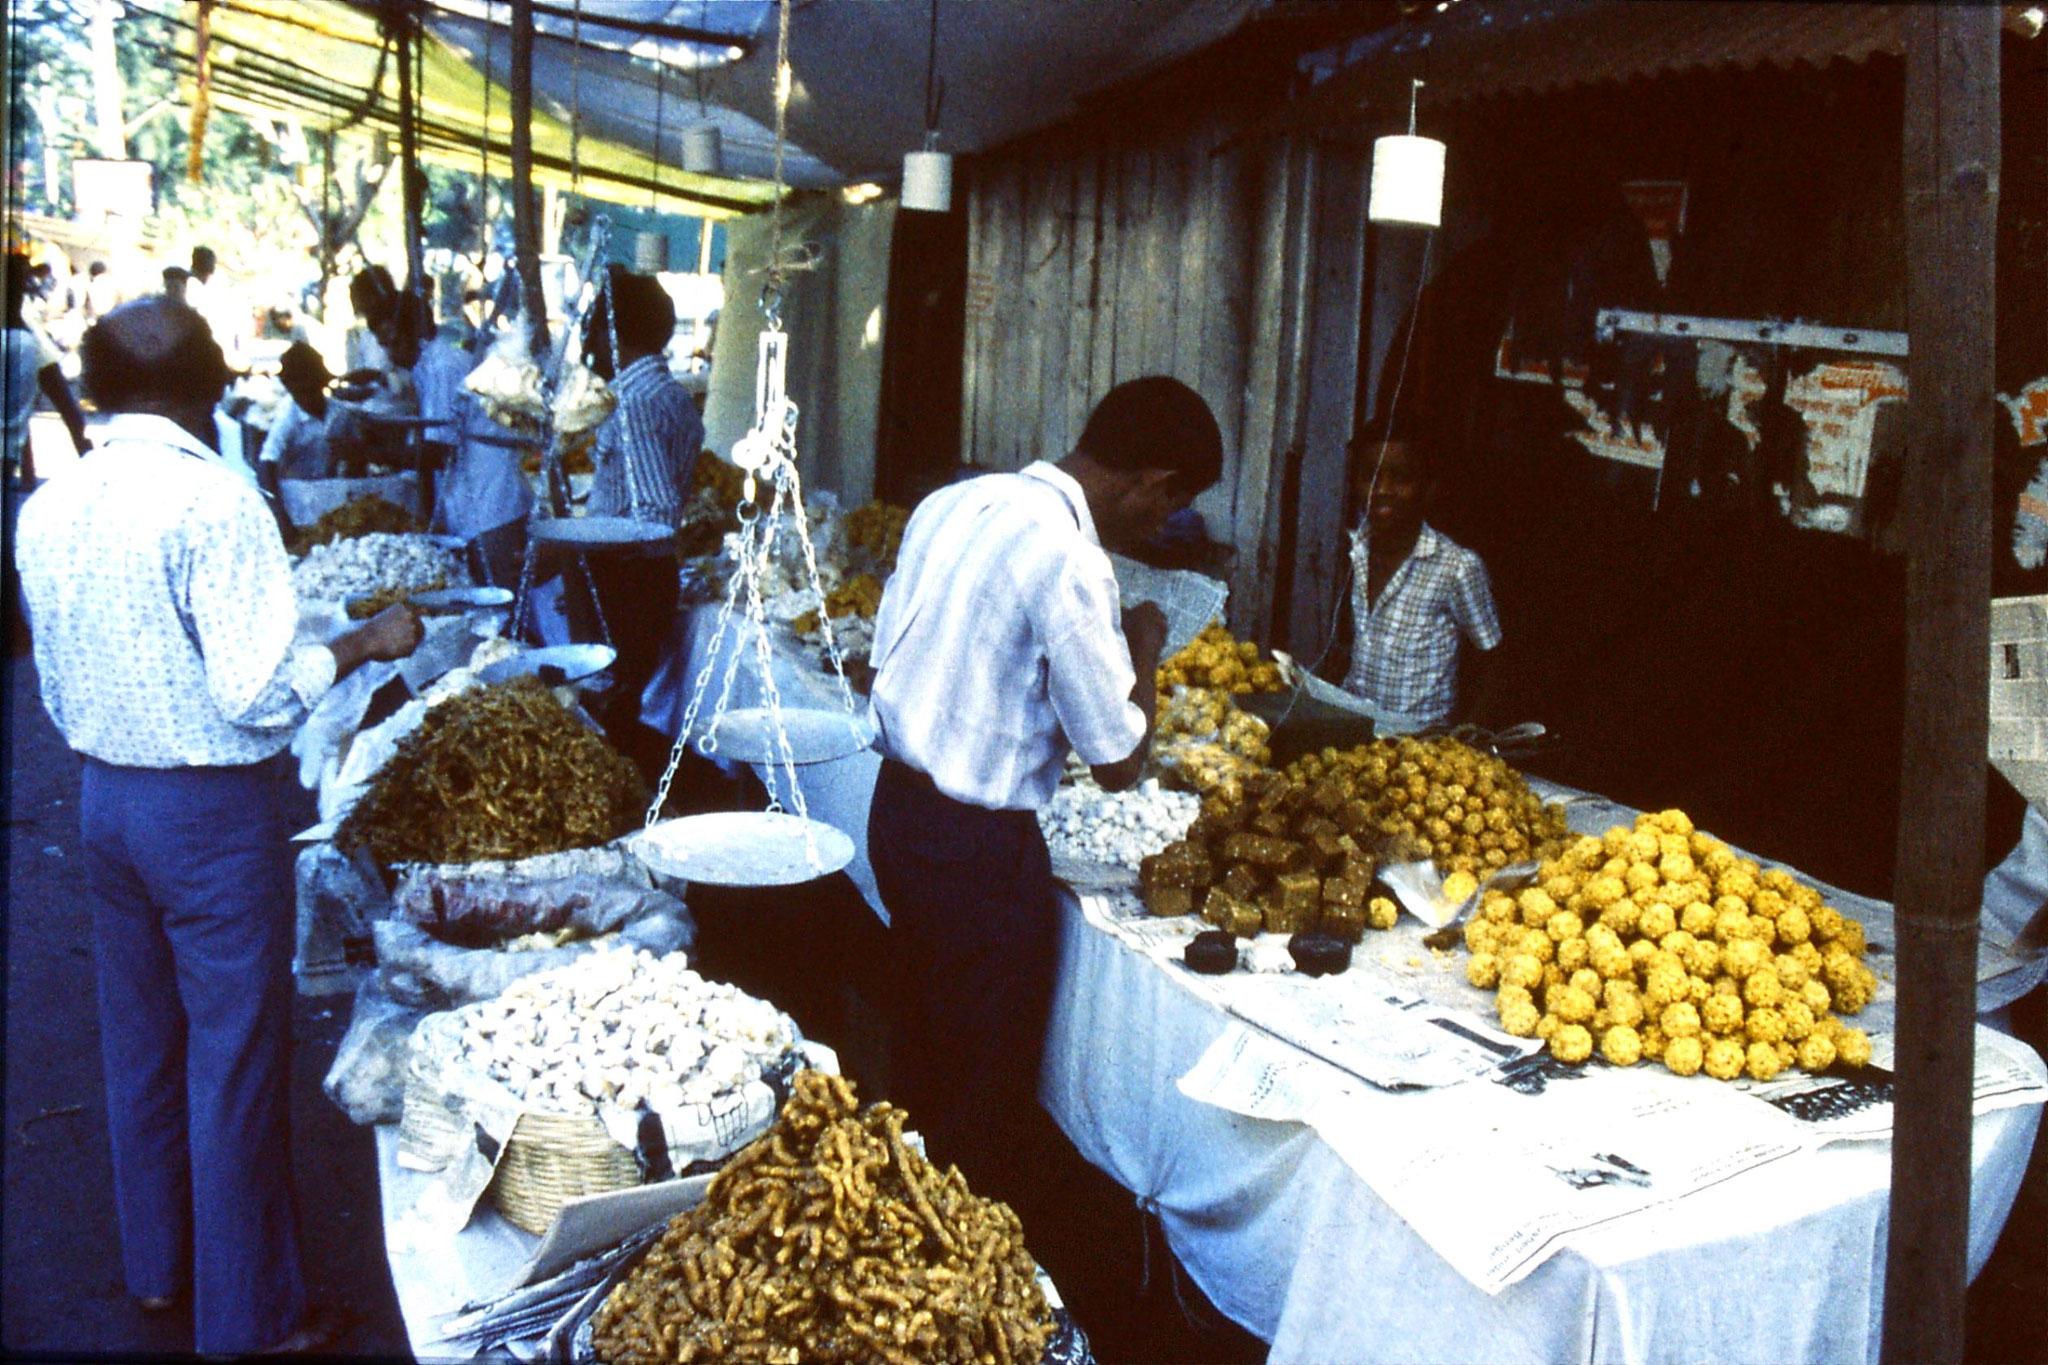 31/12/1989: 5:Goa Siolim church and market on festival day